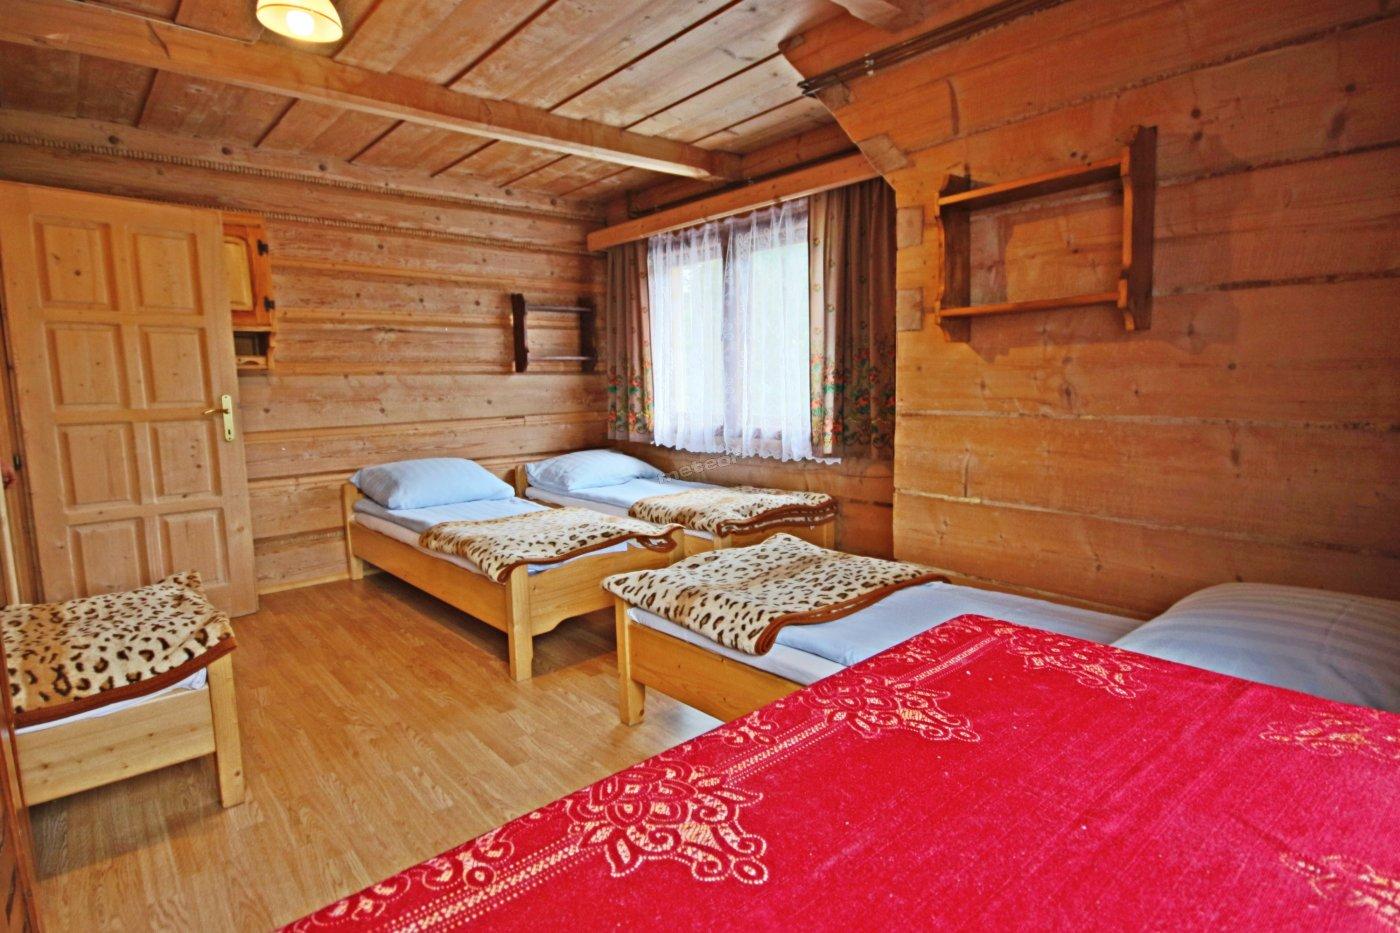 Gästezimmer - Landtouristik